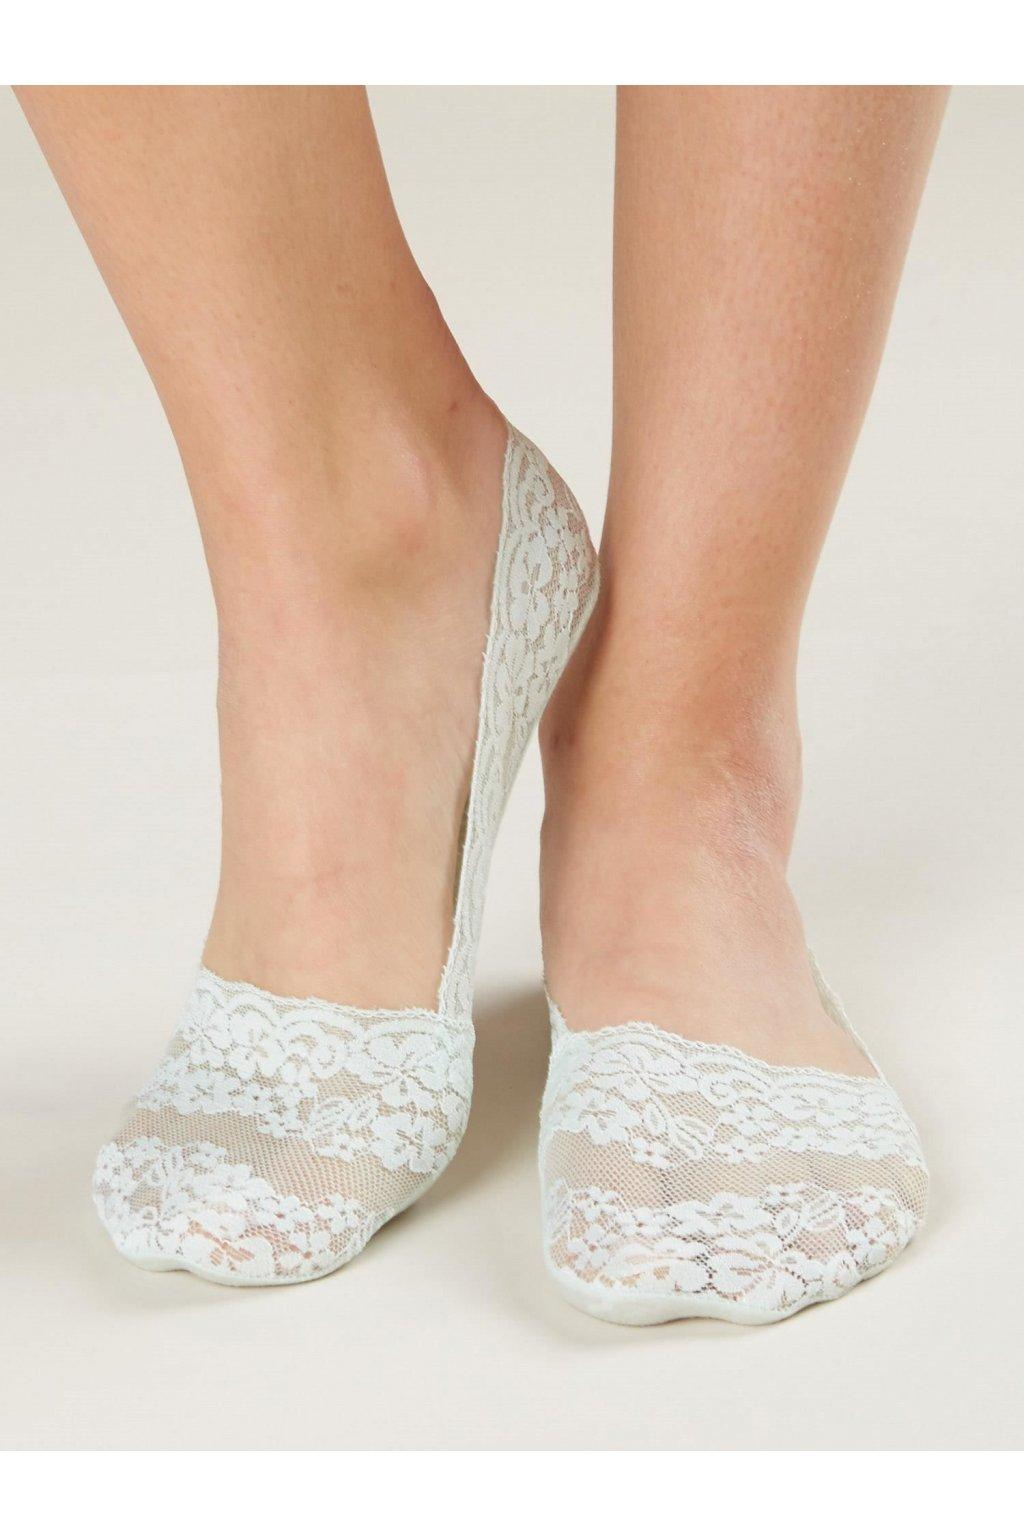 Dámske ponožky kód 7-SR-WSWC037(1)